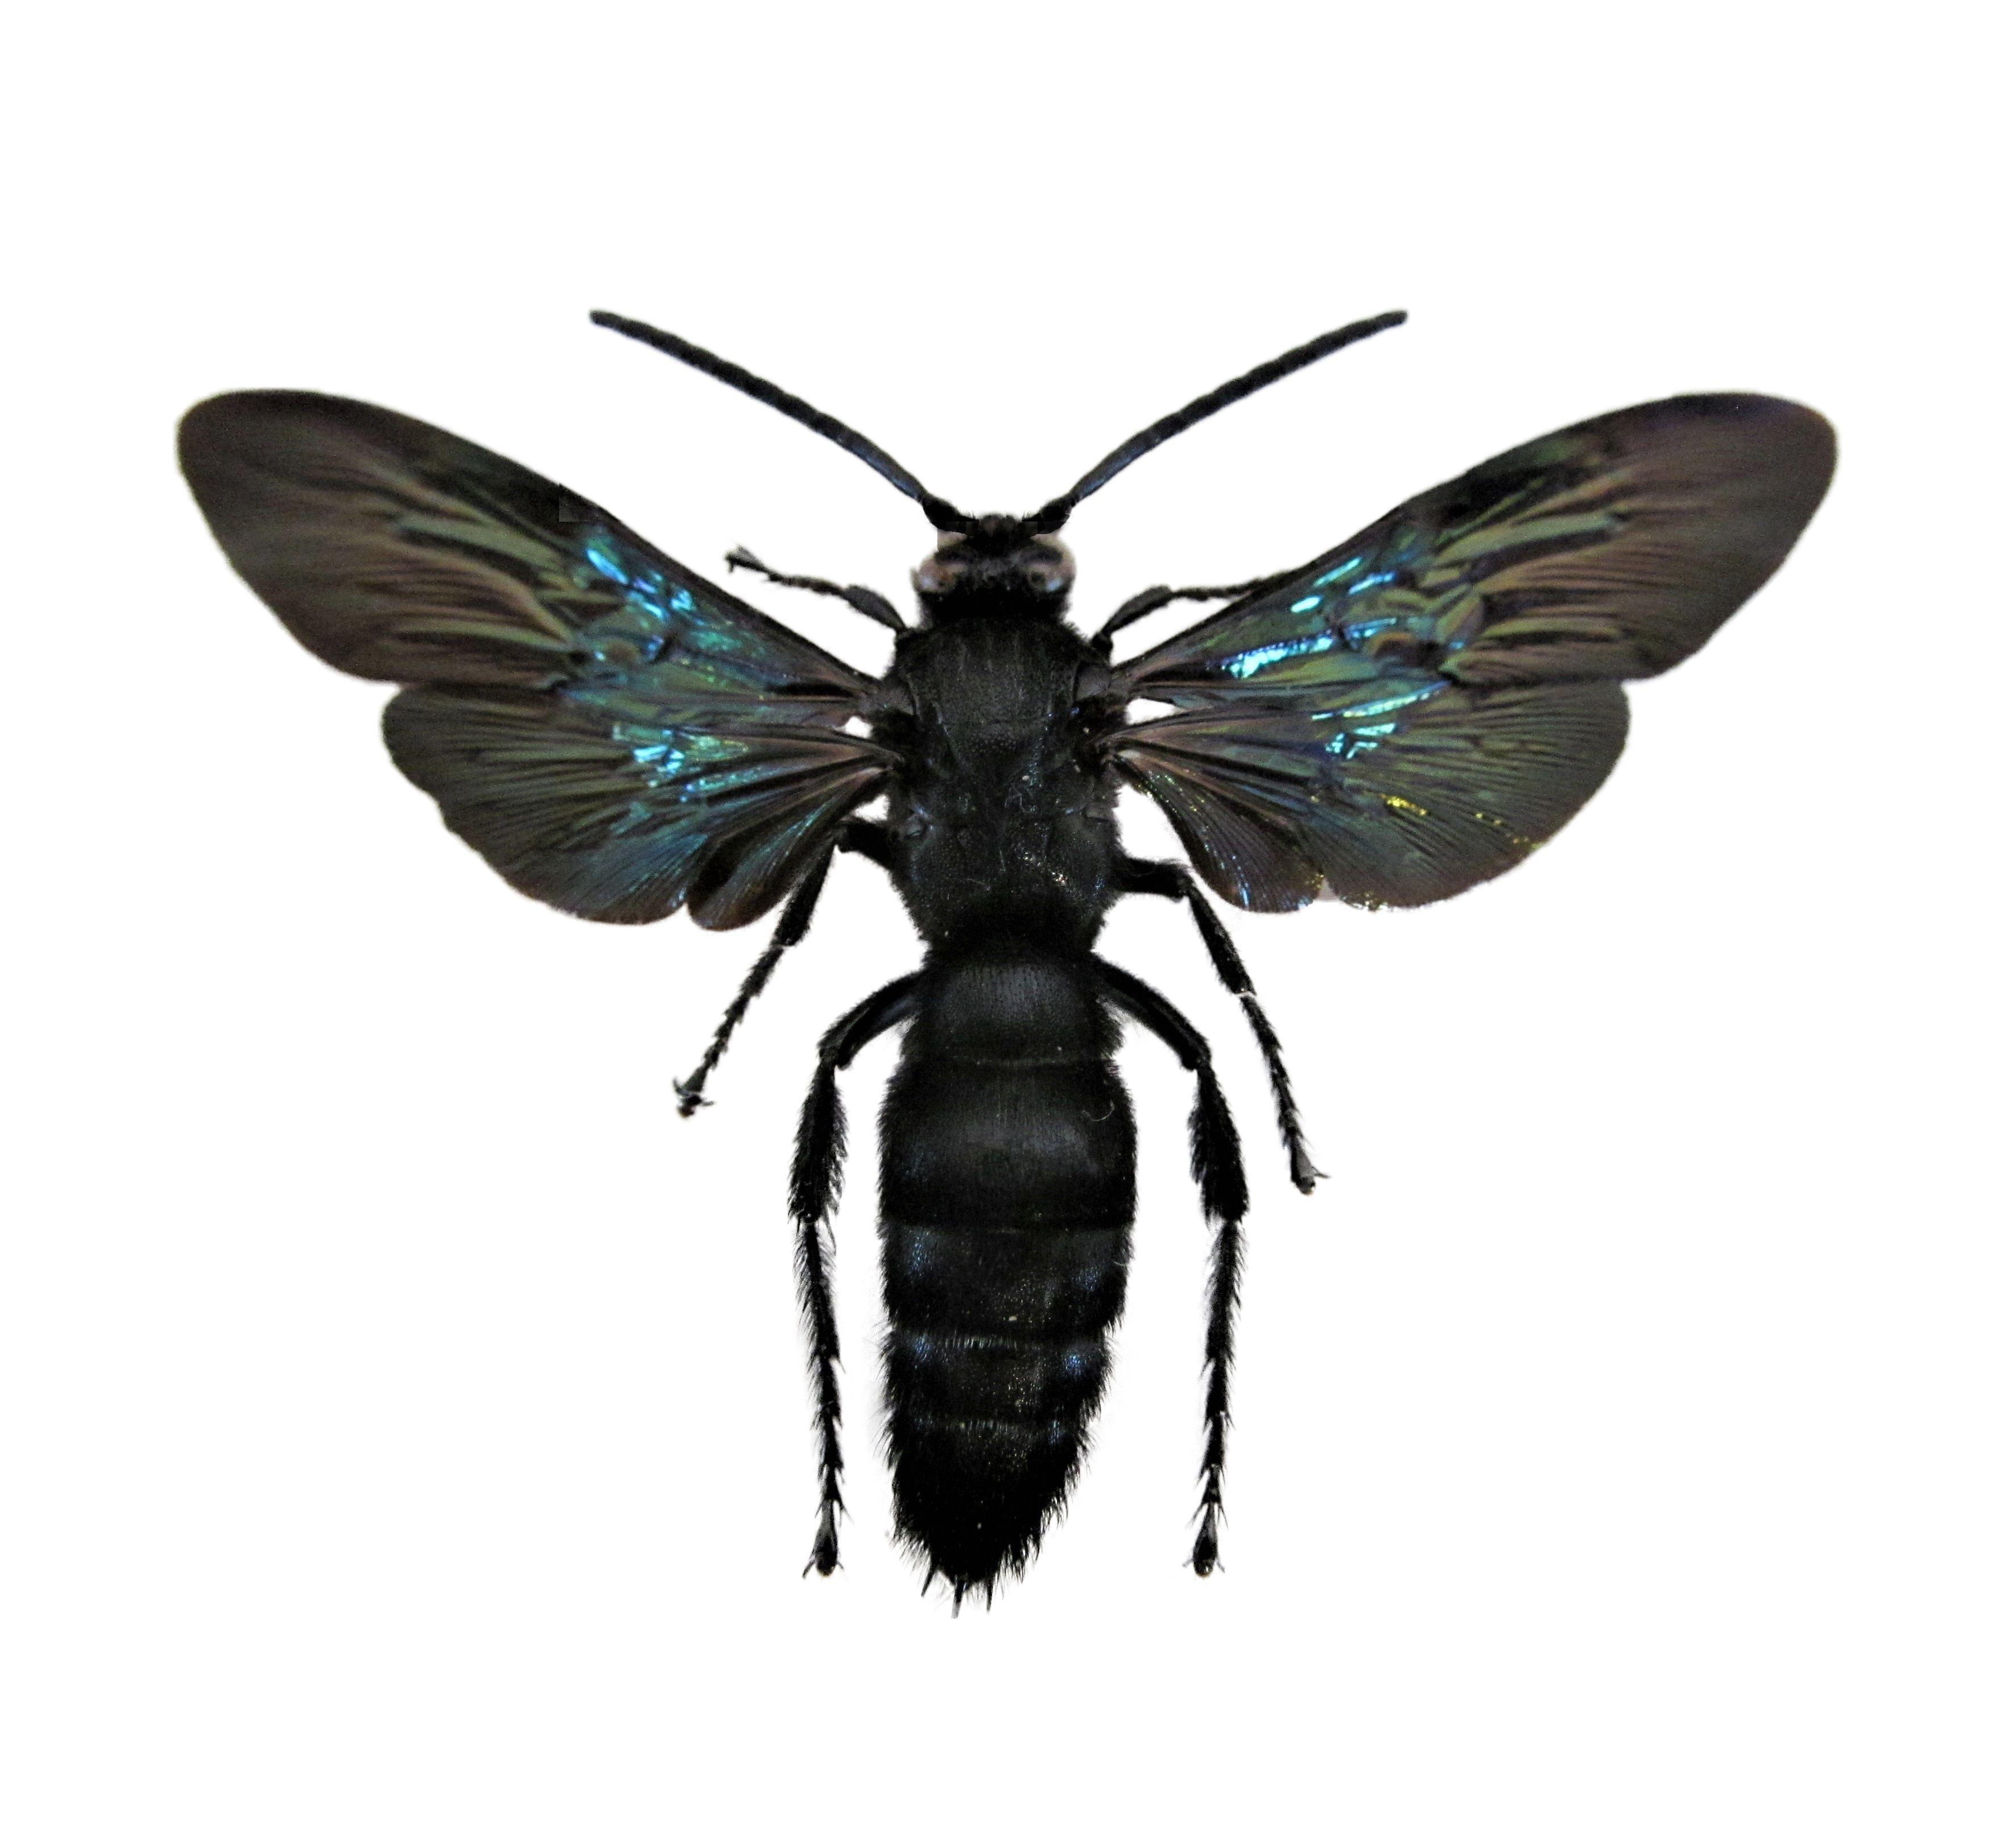 Megascolia azurea wasp Indonesia Wasp, Bees and